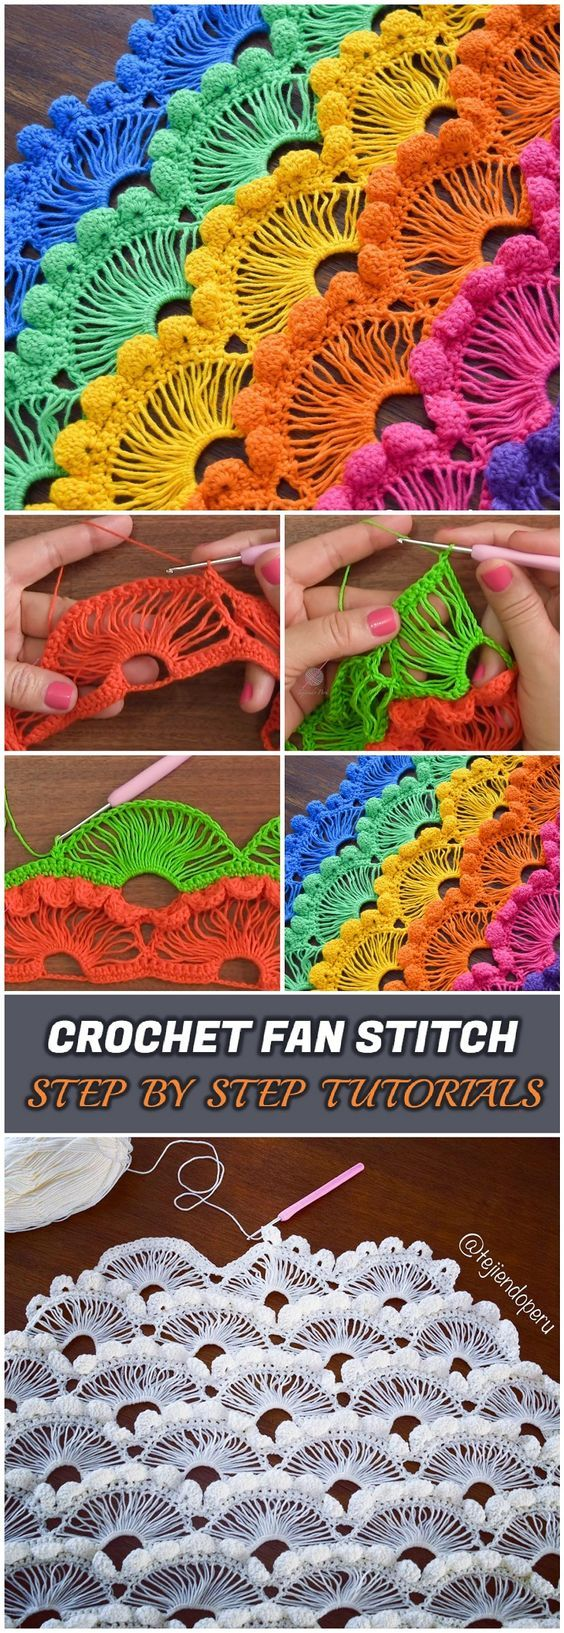 Crochet Fan Stitch - Step By Step Tutorials   Häkelmuster, Häkeln ...